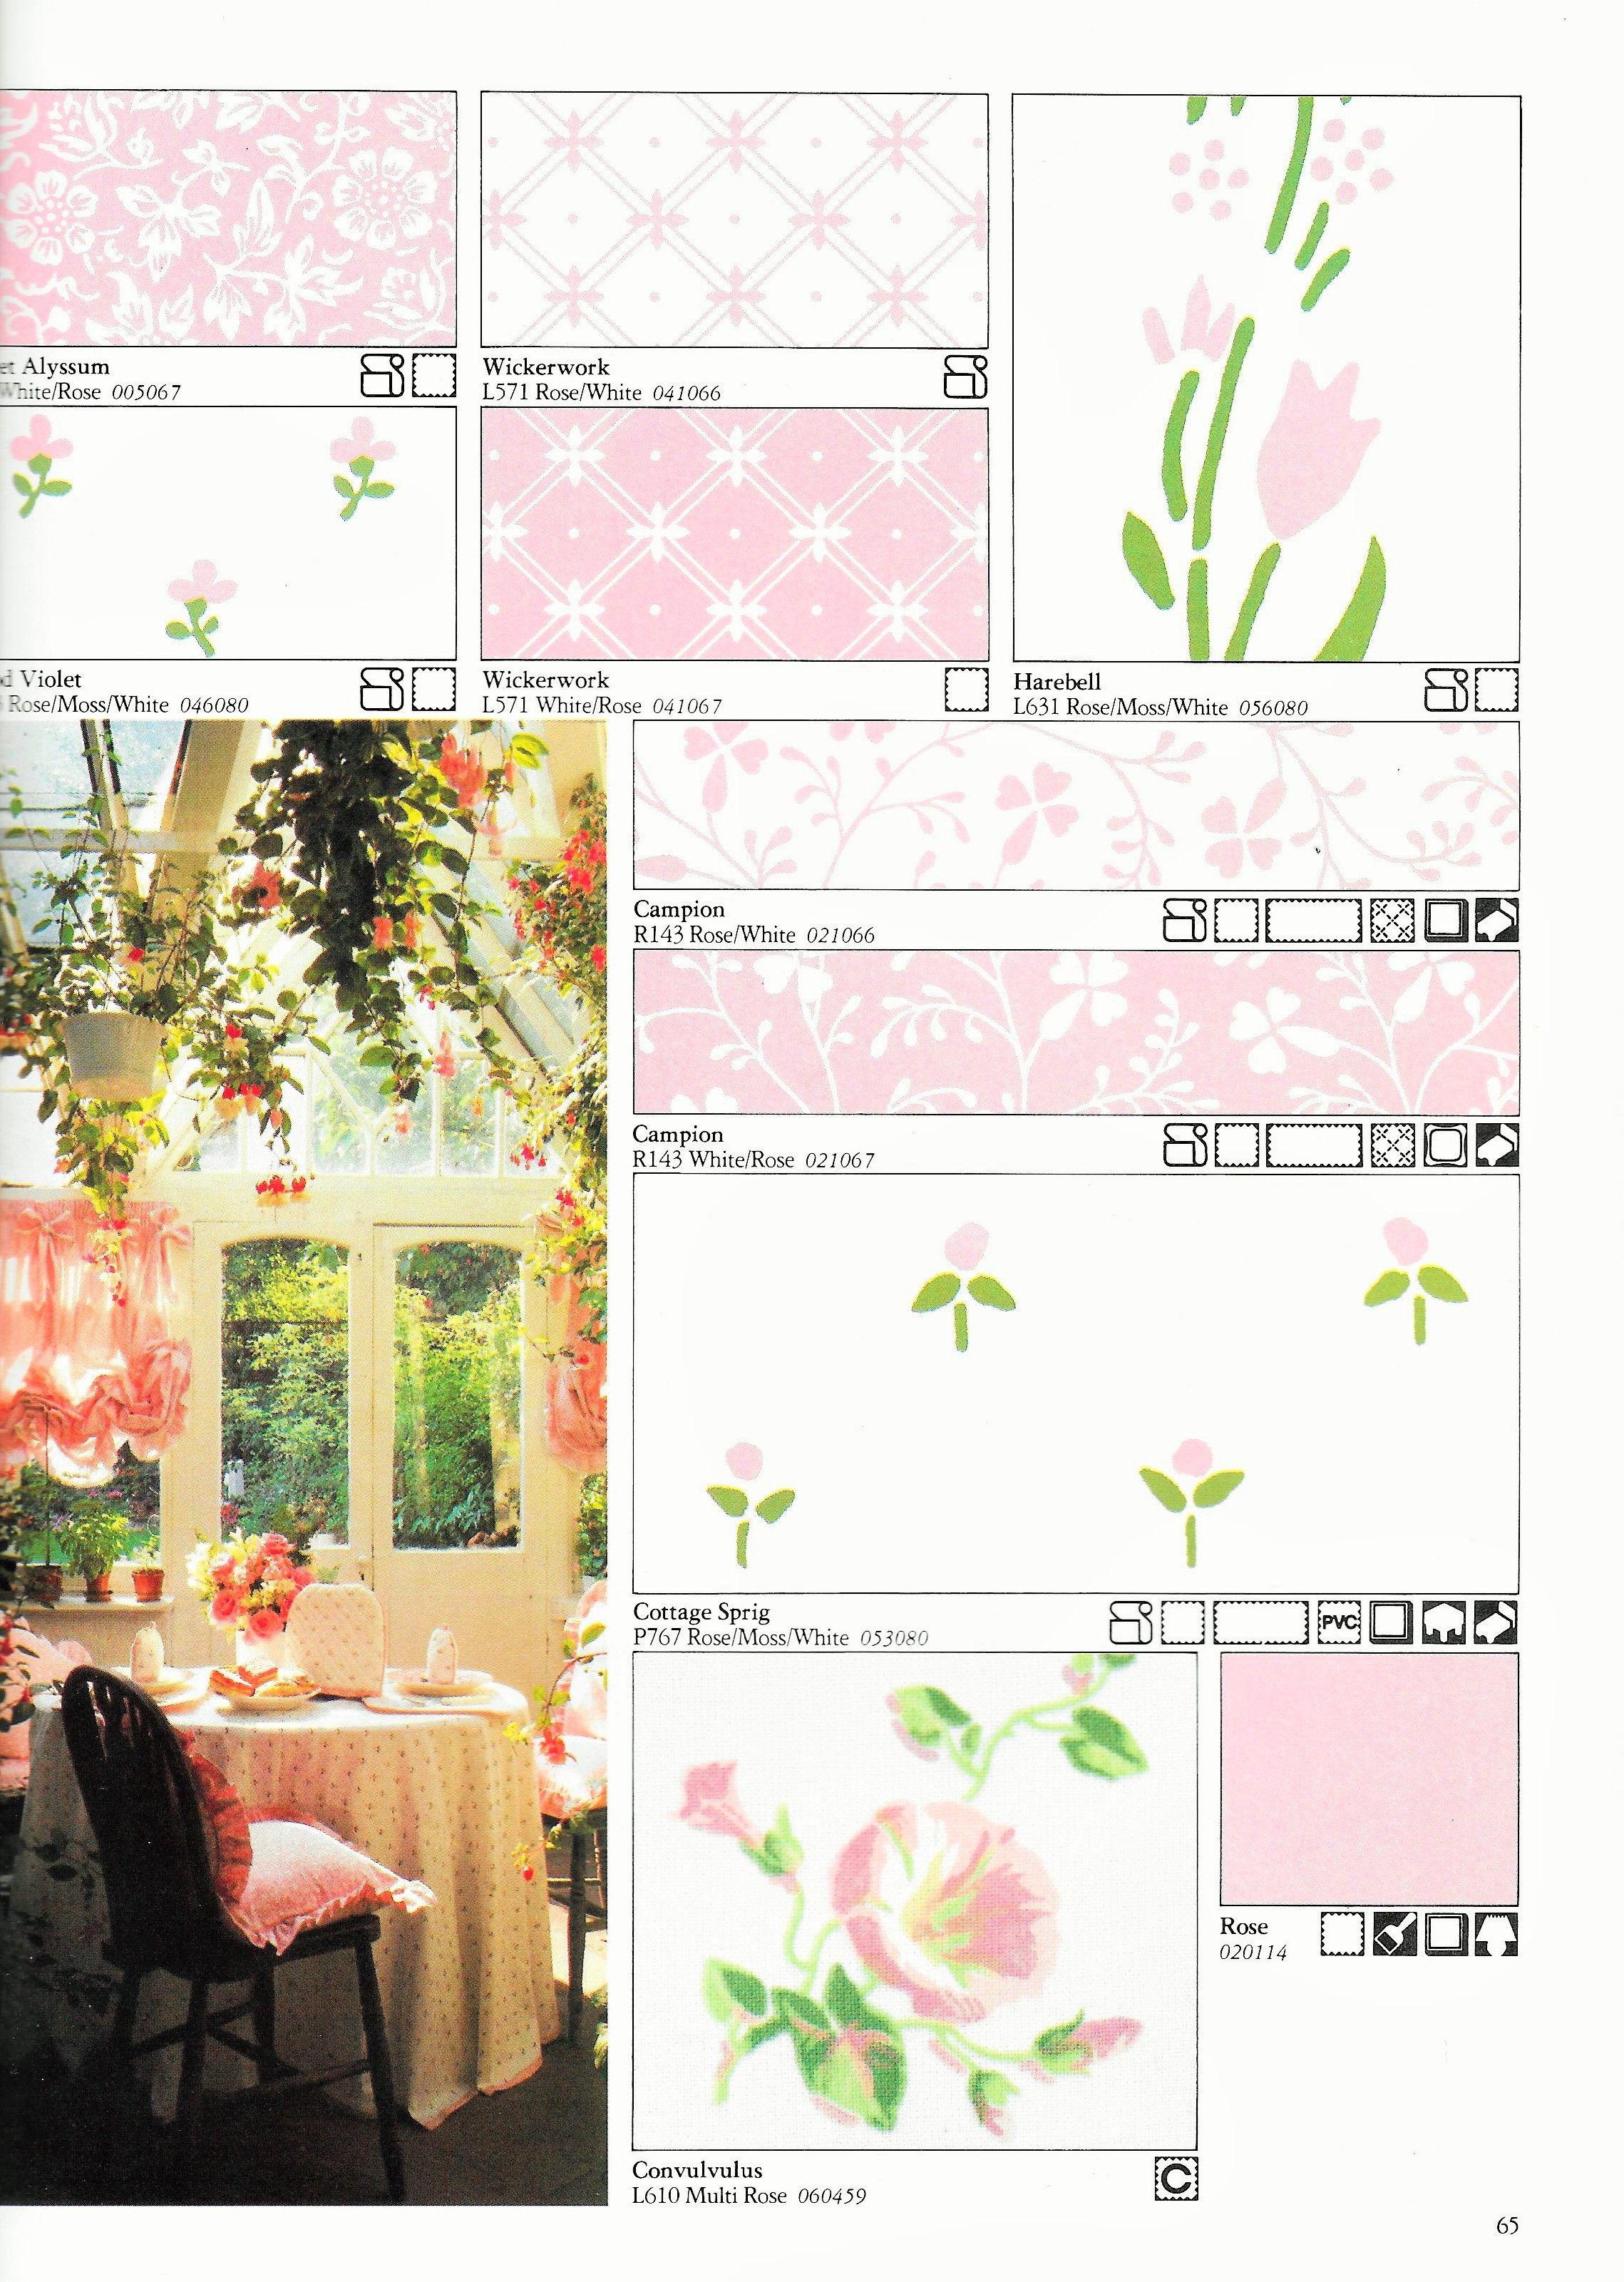 Laura Ashley 1983 Home Furnishings Catalogue Sweet Alyssum Wood Violet Wickerwork Harebell